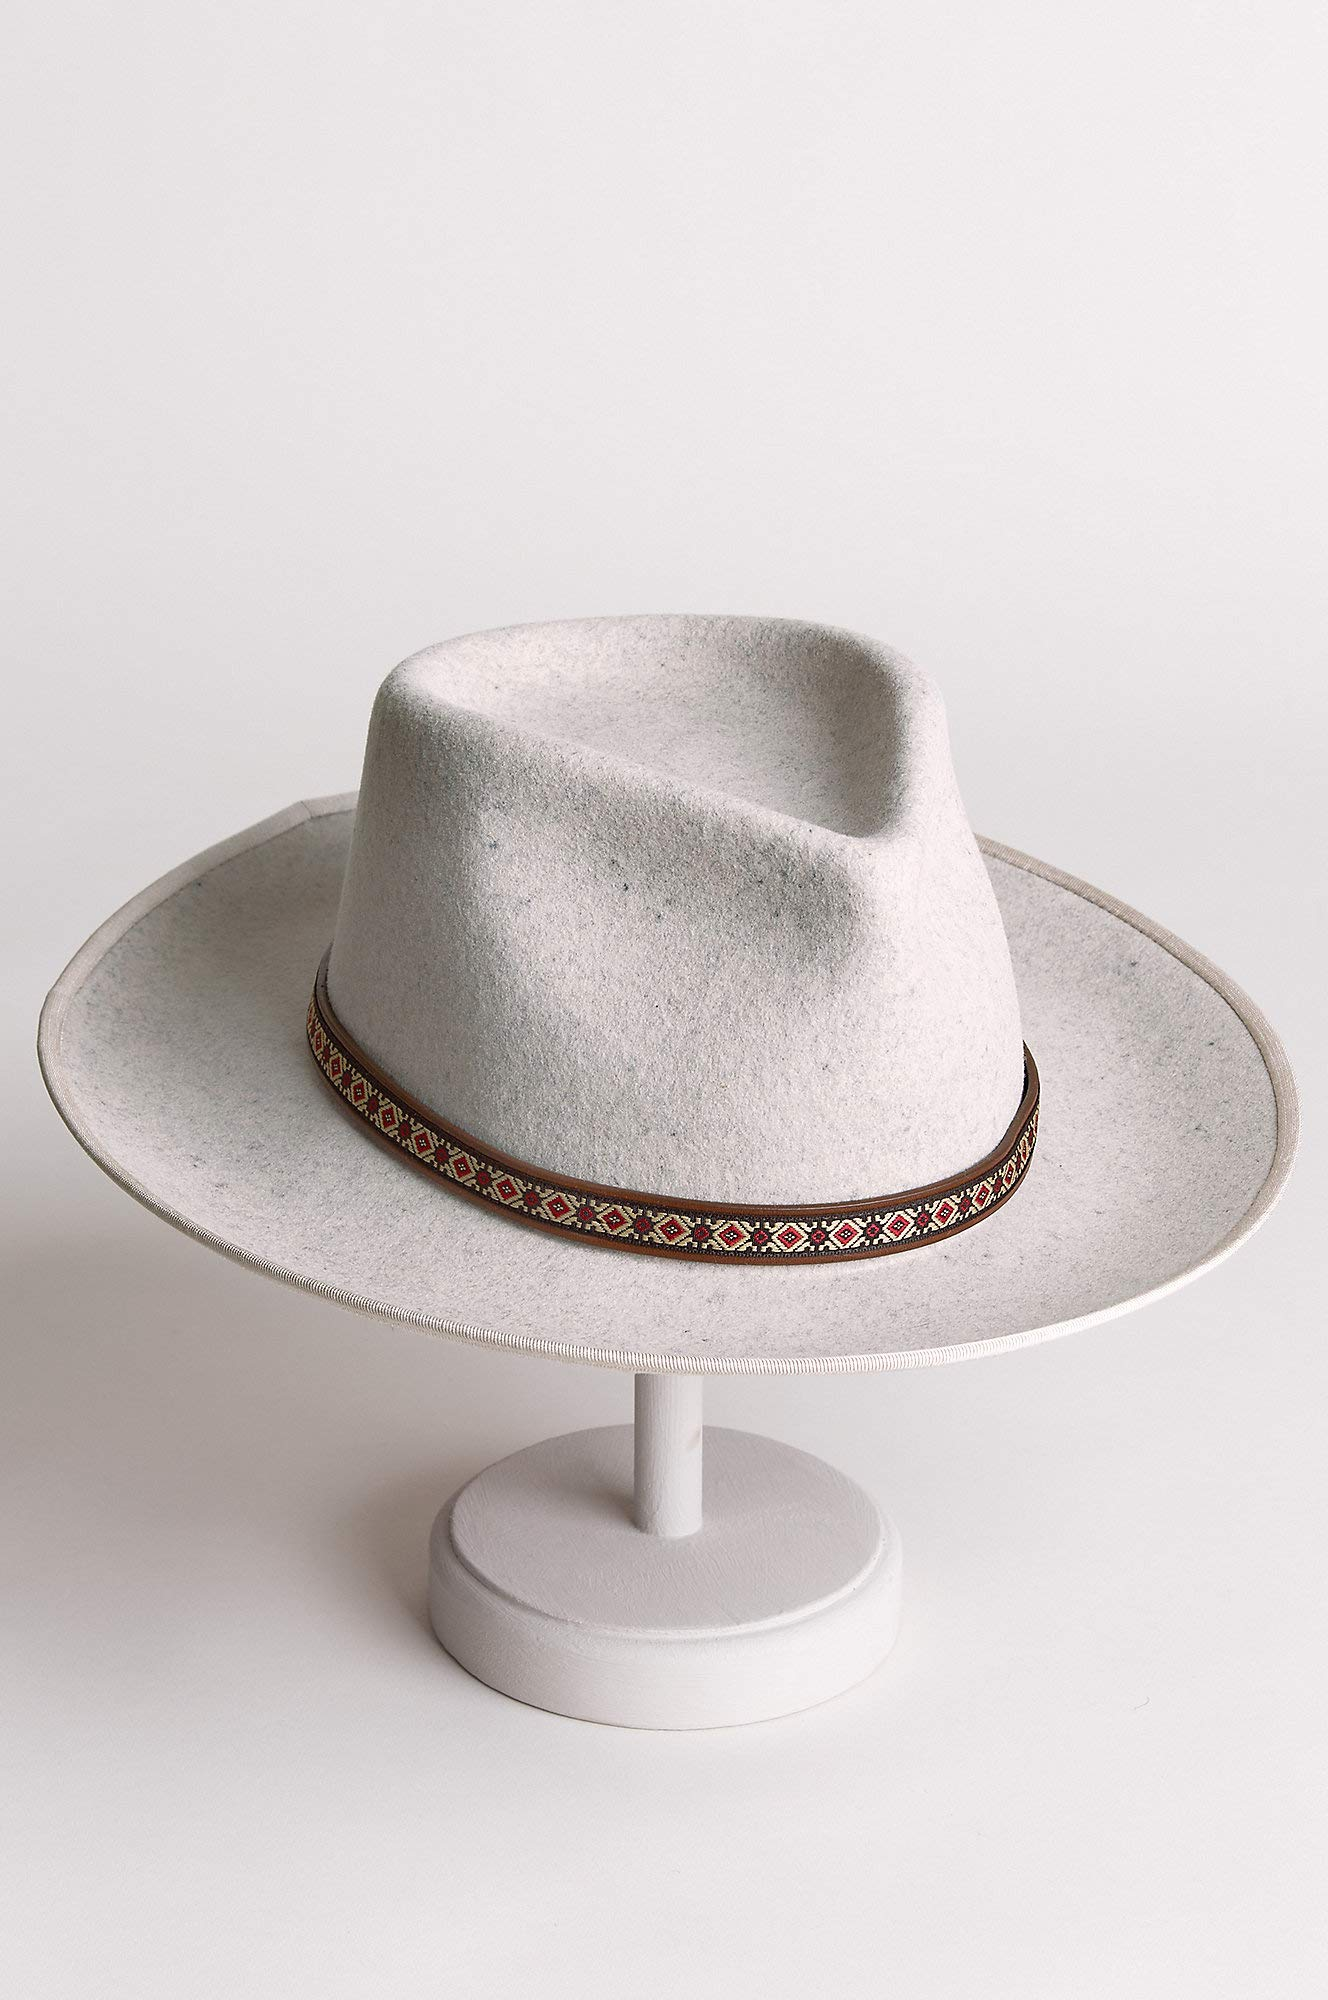 Overland Sheepskin Co Alpes Wide Brim Wool Felt Fedora Hat by Overland Sheepskin Co (Image #5)